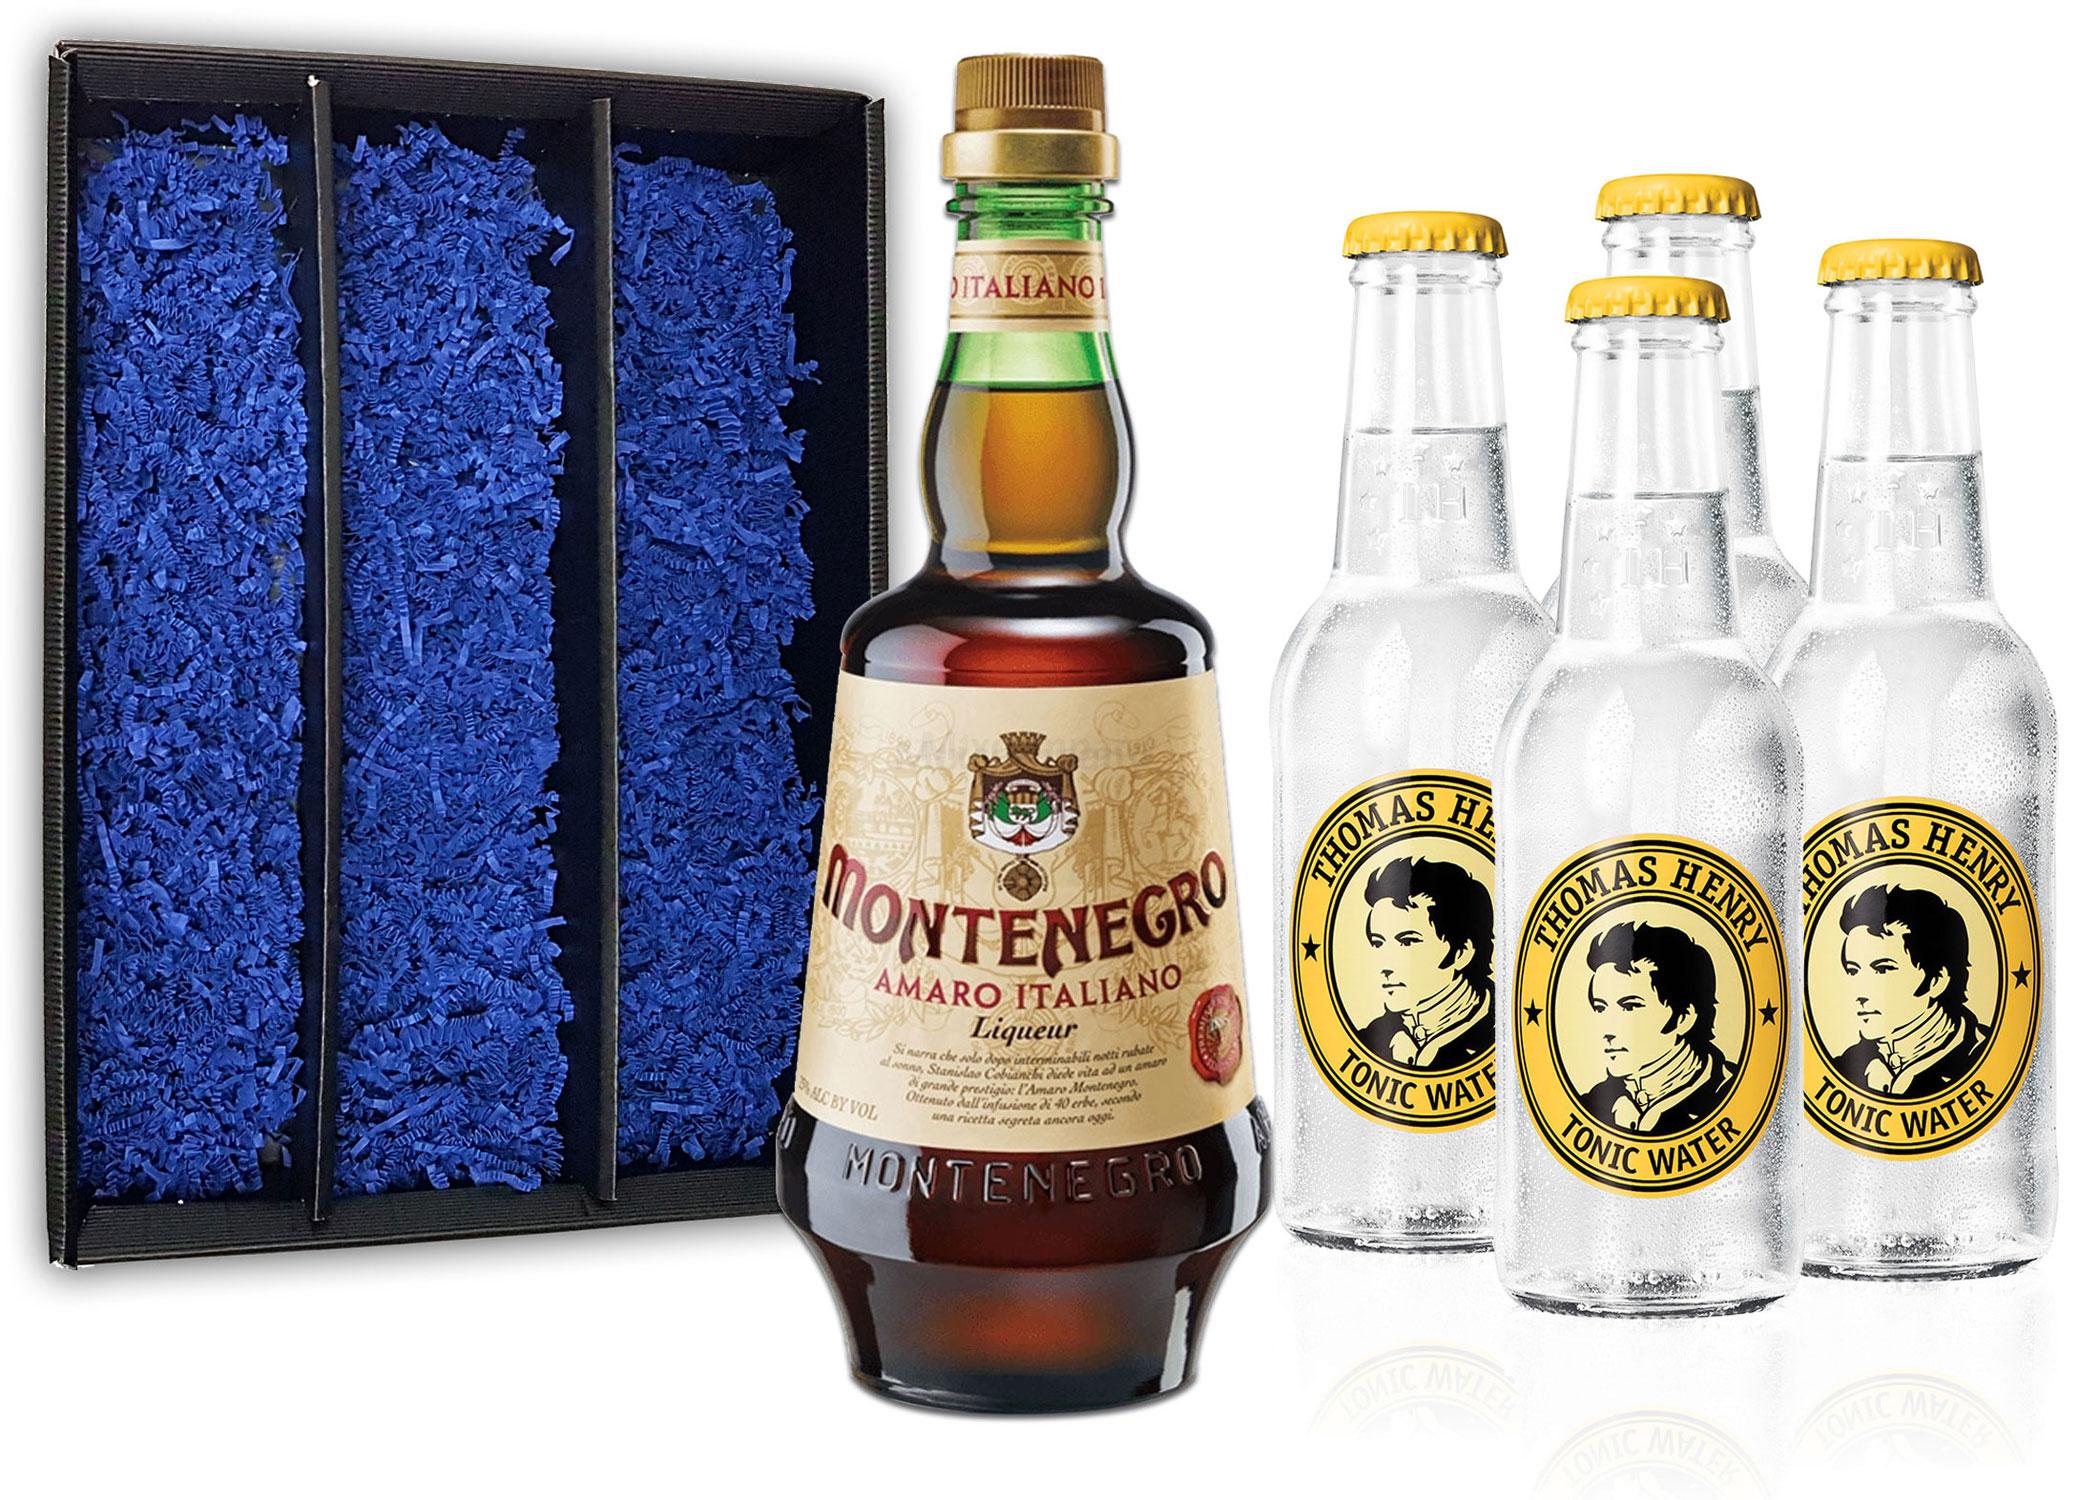 Montenegro & Tonic Geschenkset - Montenegro Amaro Italiano Likör 0,7L (23% Vol) + 4x Thomas Henry Tonic Water 200ml inkl. Pfand MEHRWEG